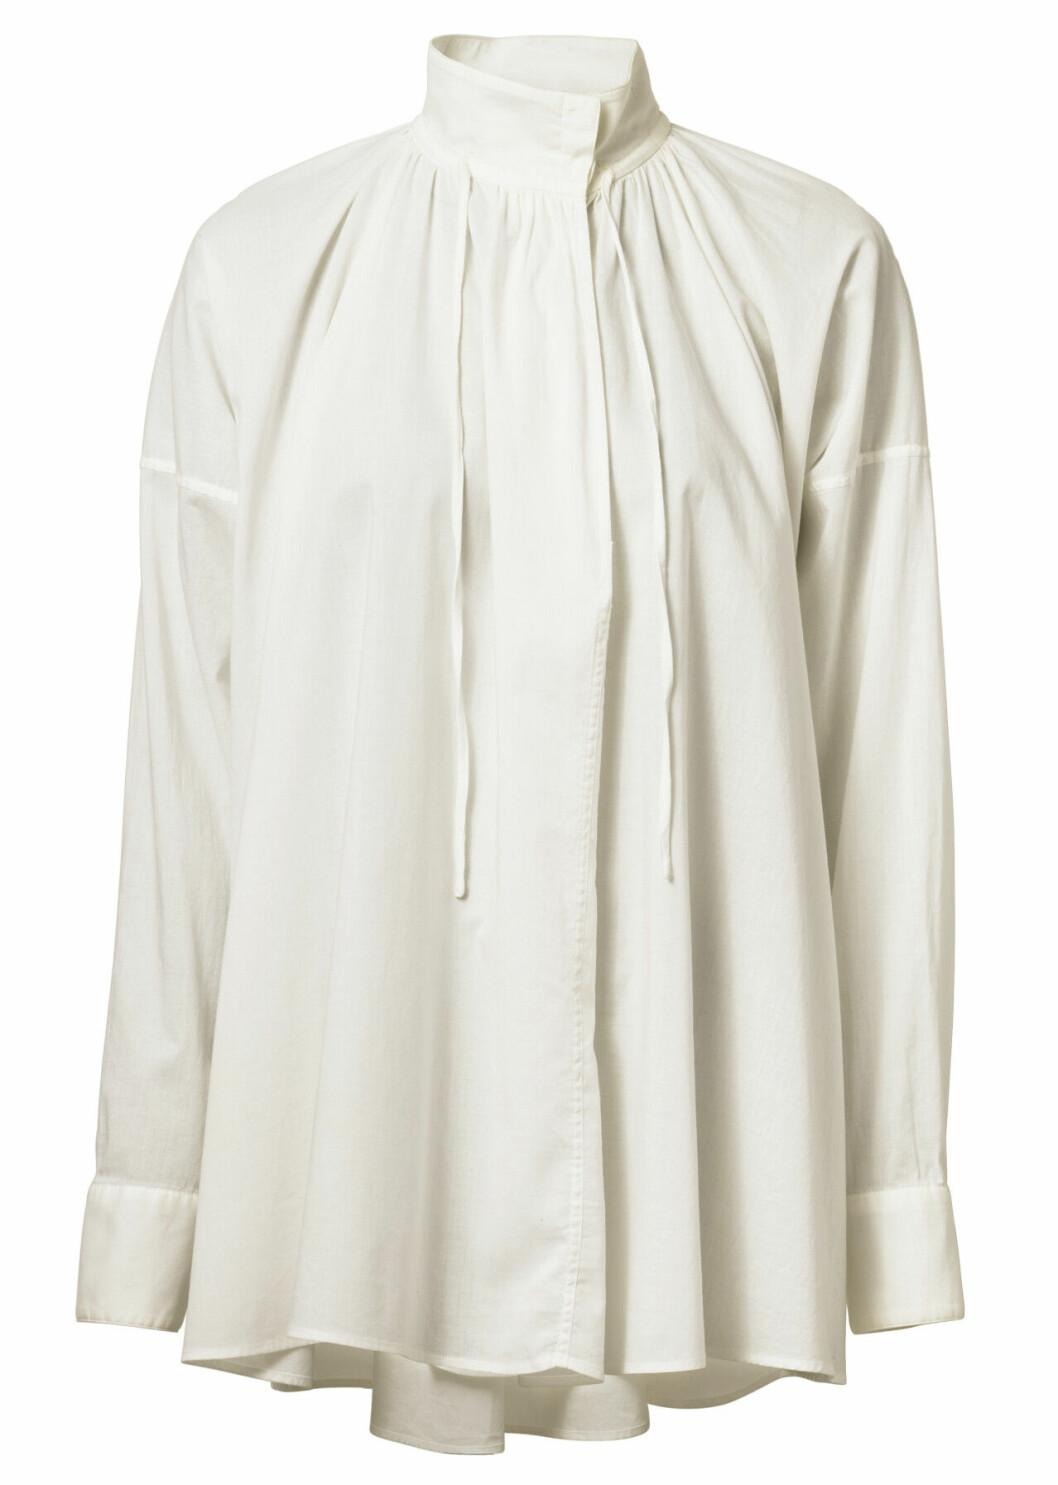 H&M conscious exclusive SS20 – vit blus med hög krage